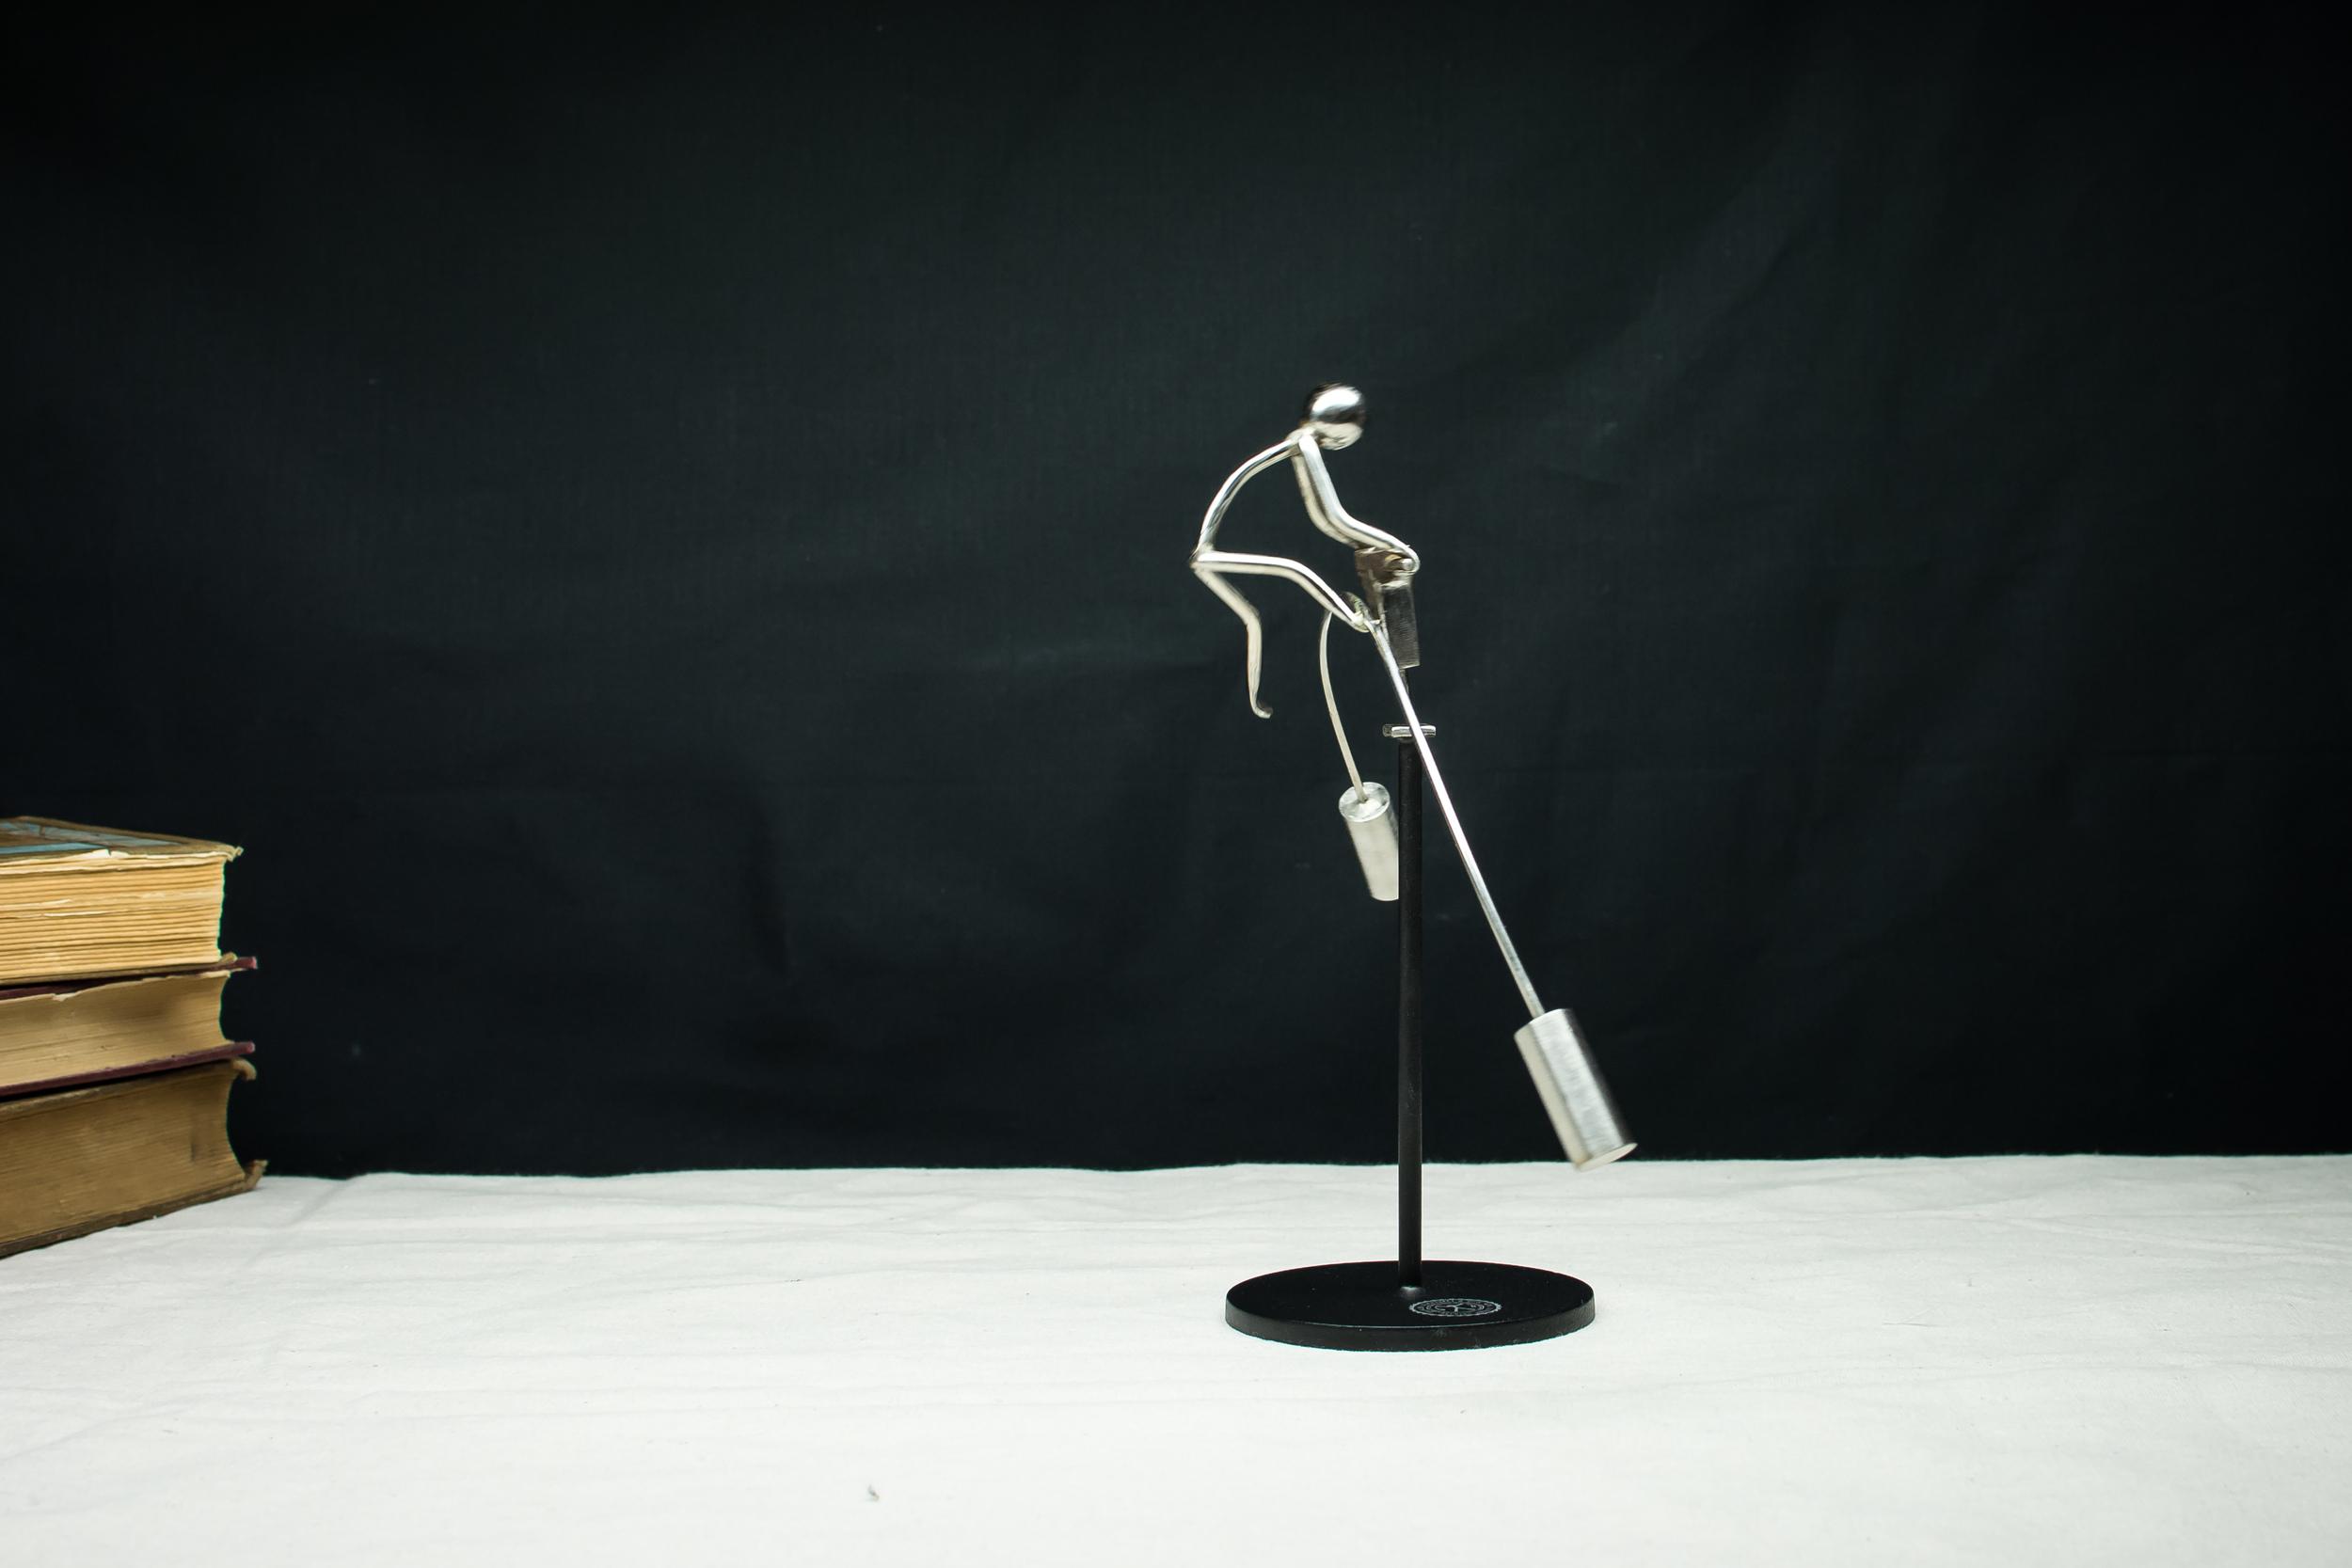 jackhammer man-7.jpg